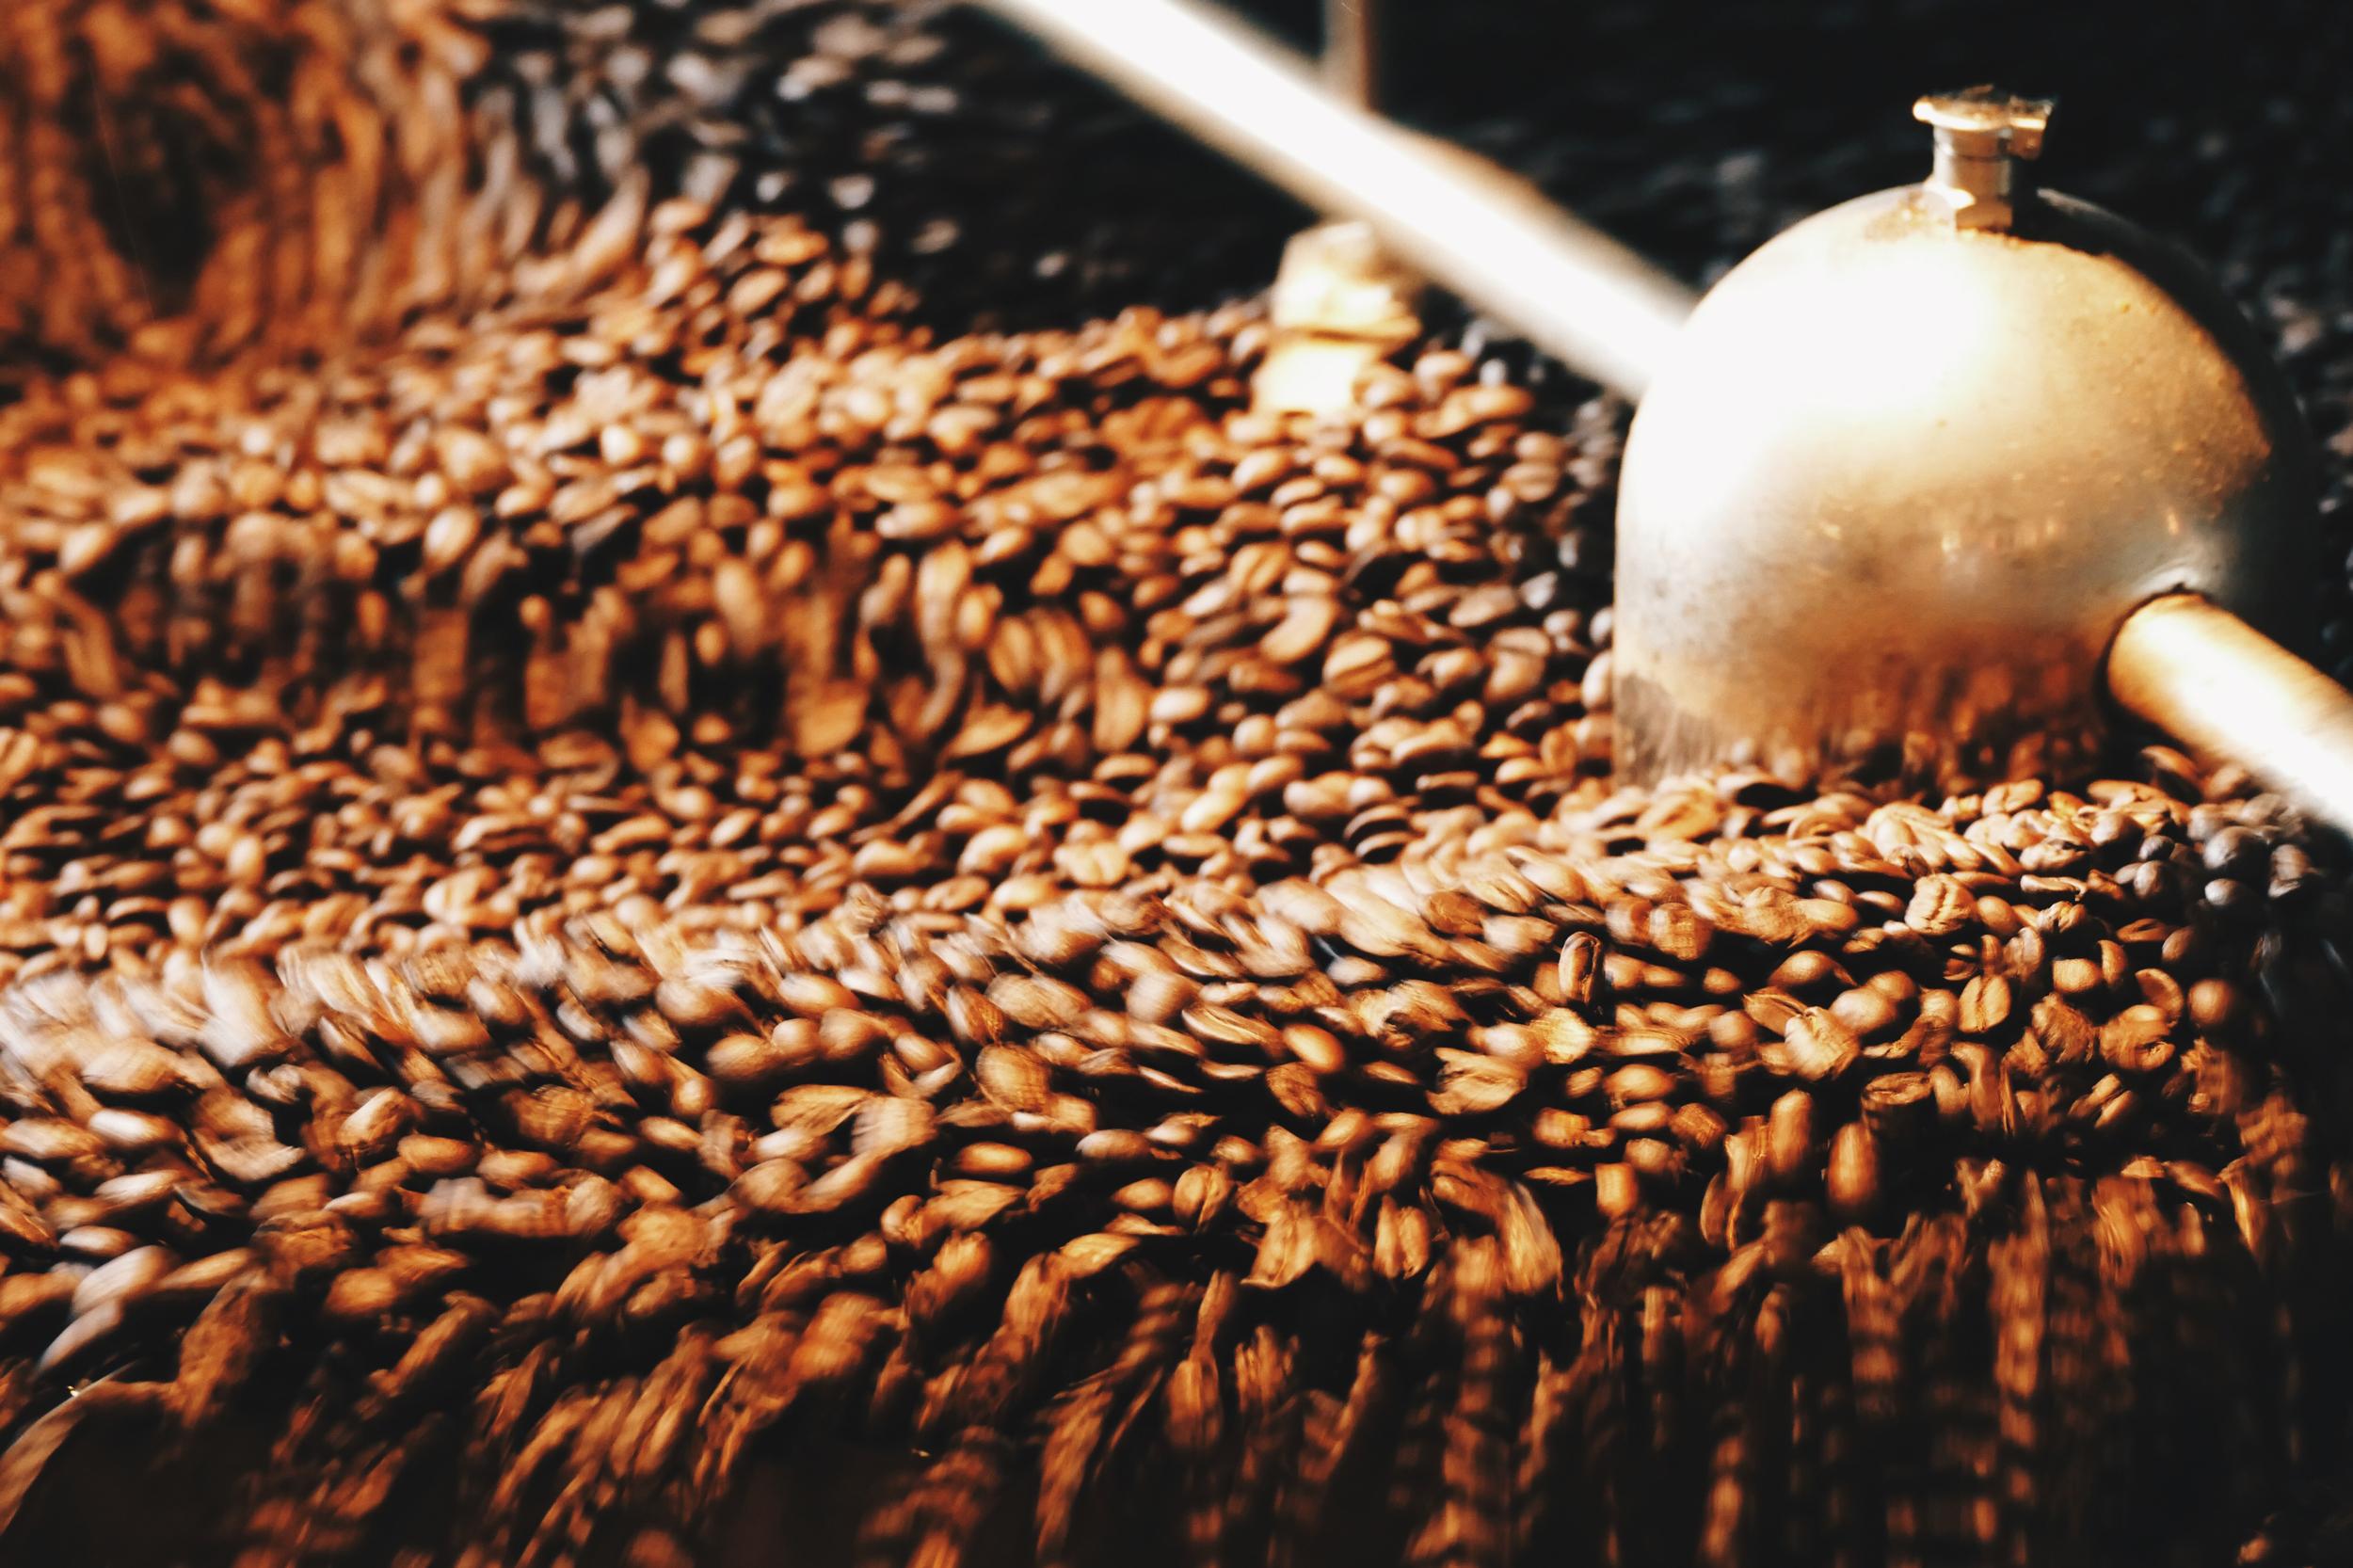 Kaffeerösterei Sylt Christian Appel